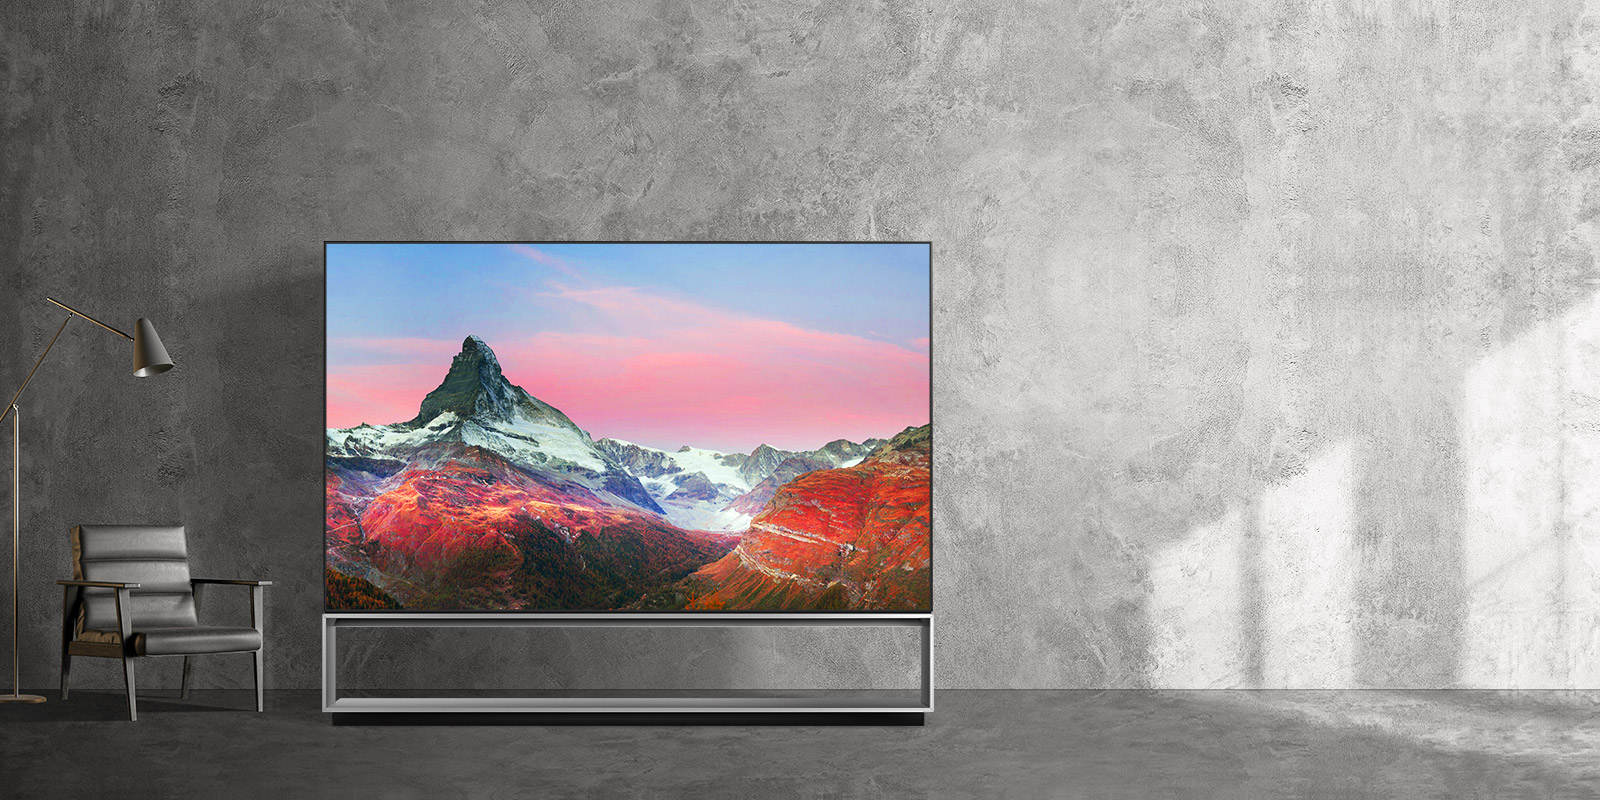 TV-SIGNATURE-OLED-8K-Image-Retention-Desktop